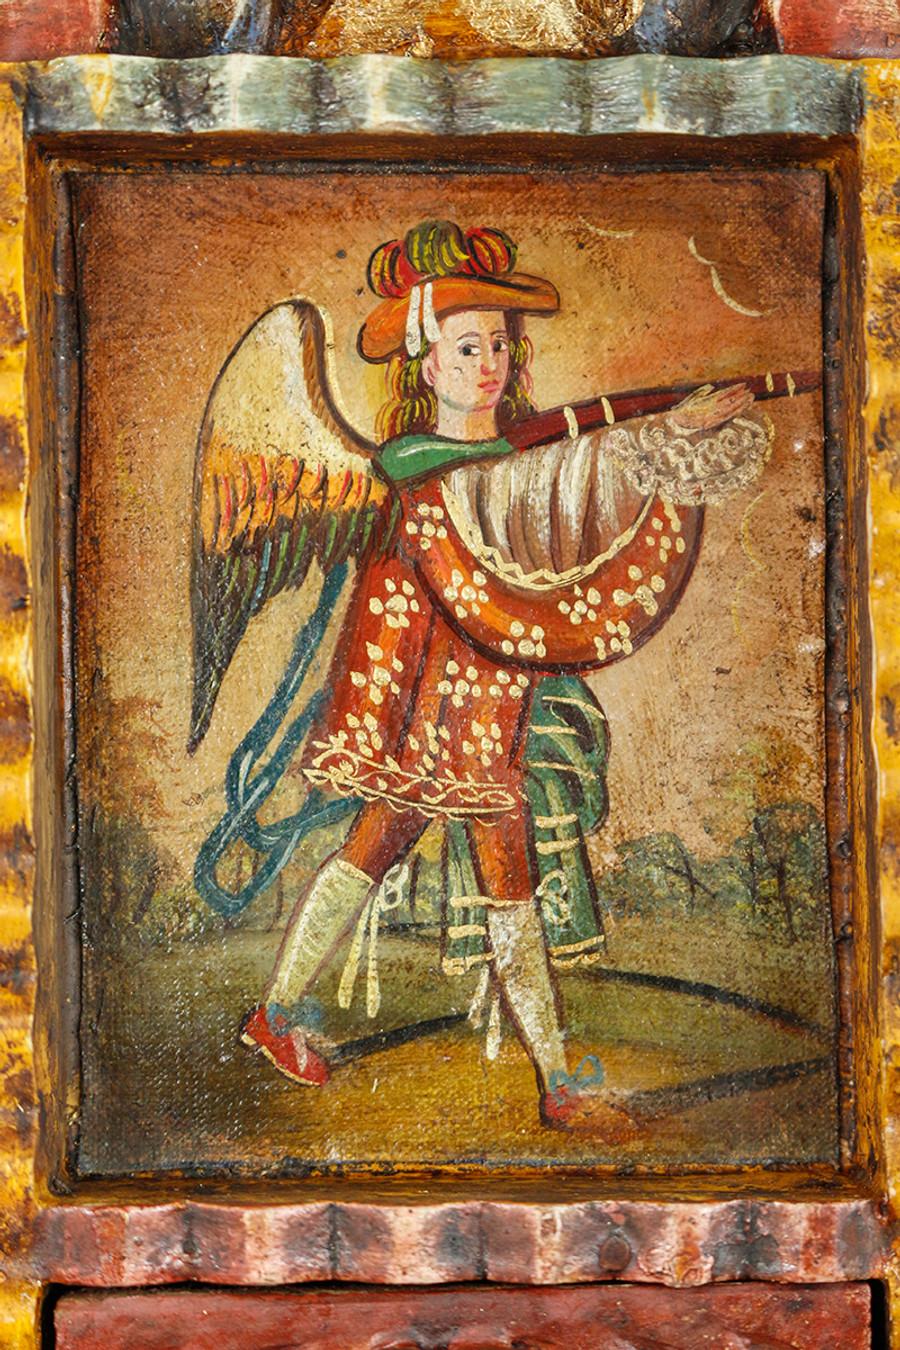 Military Archangel Colonial Peru Art Handmade Retablo Handcarved Altarpiece (71-100-04433)